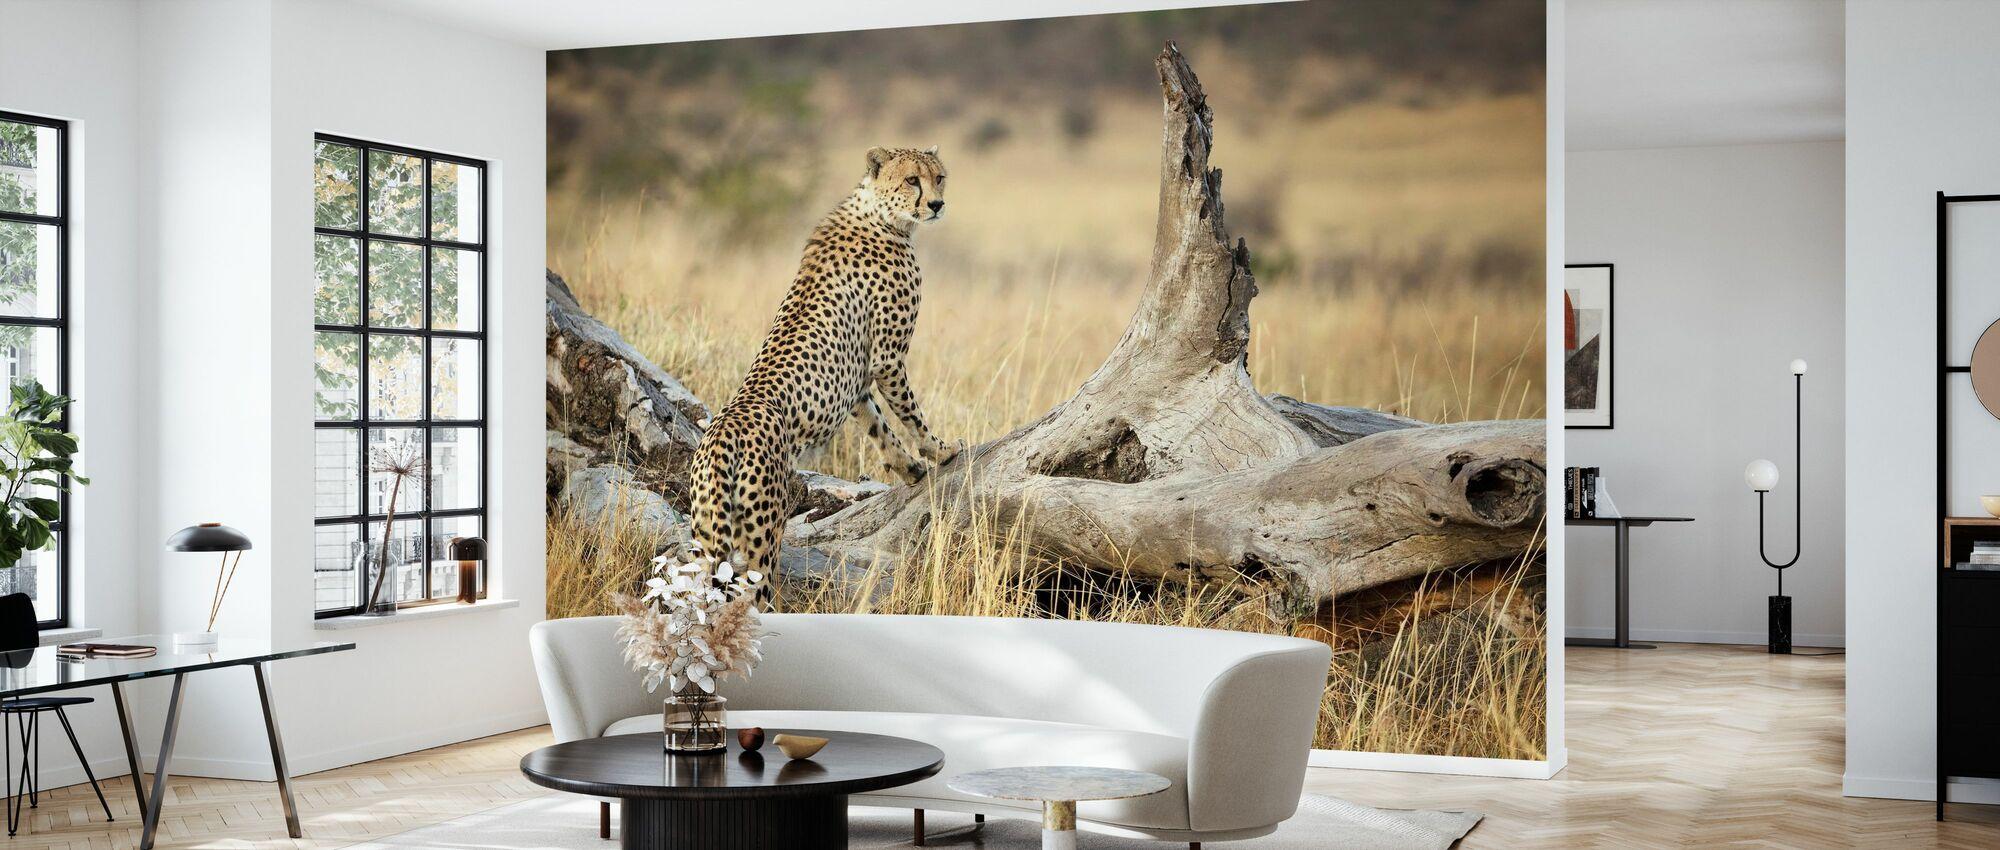 Strong - Wallpaper - Living Room